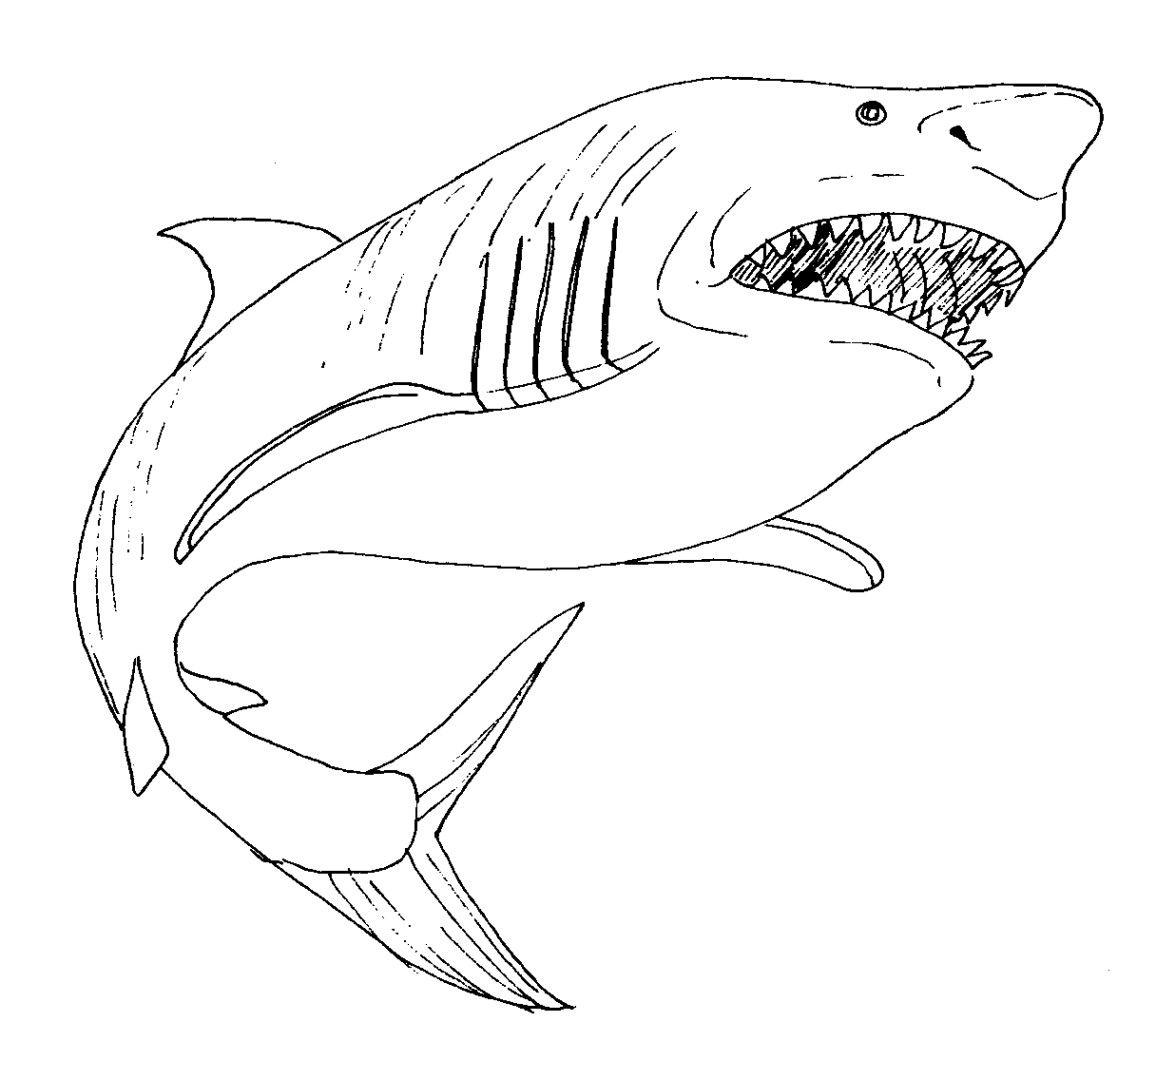 Pin By Michal Szoll On Kolorowanki Shark Coloring Pages Animal Coloring Pages Coloring Pictures